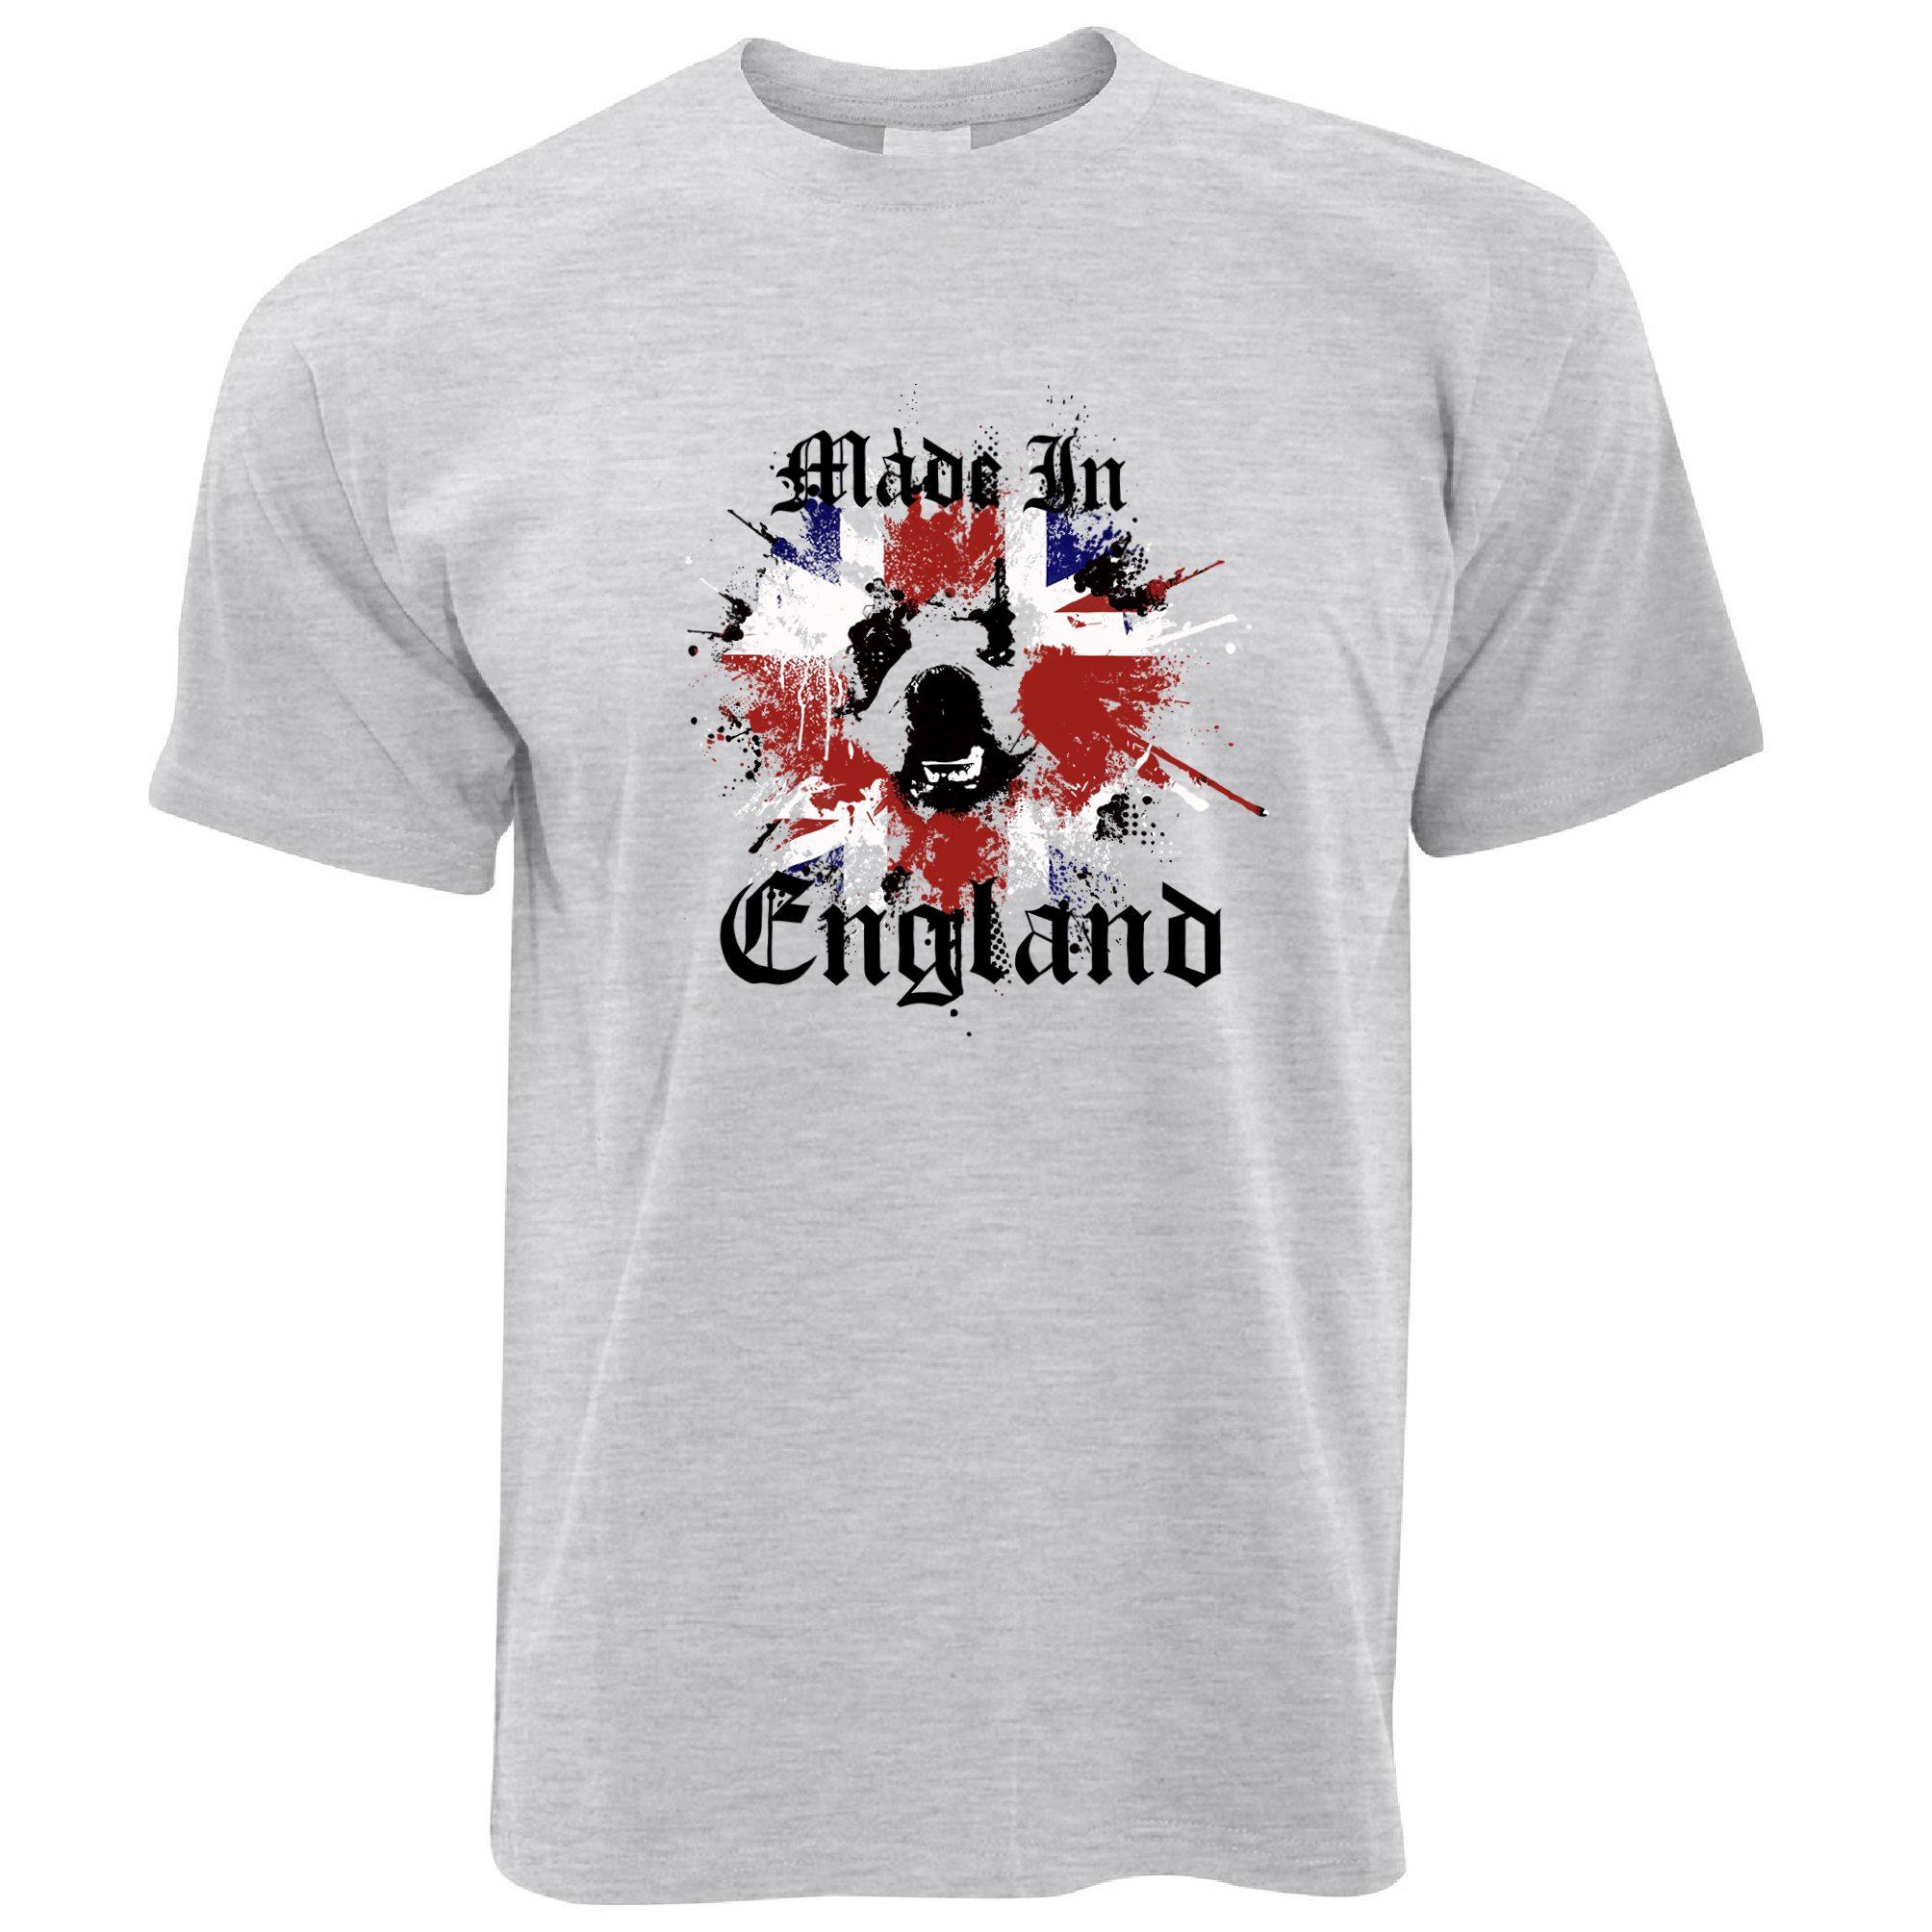 Made In England Patriotic Sweatshirt Bulldog English Proud To Be T-Shirt